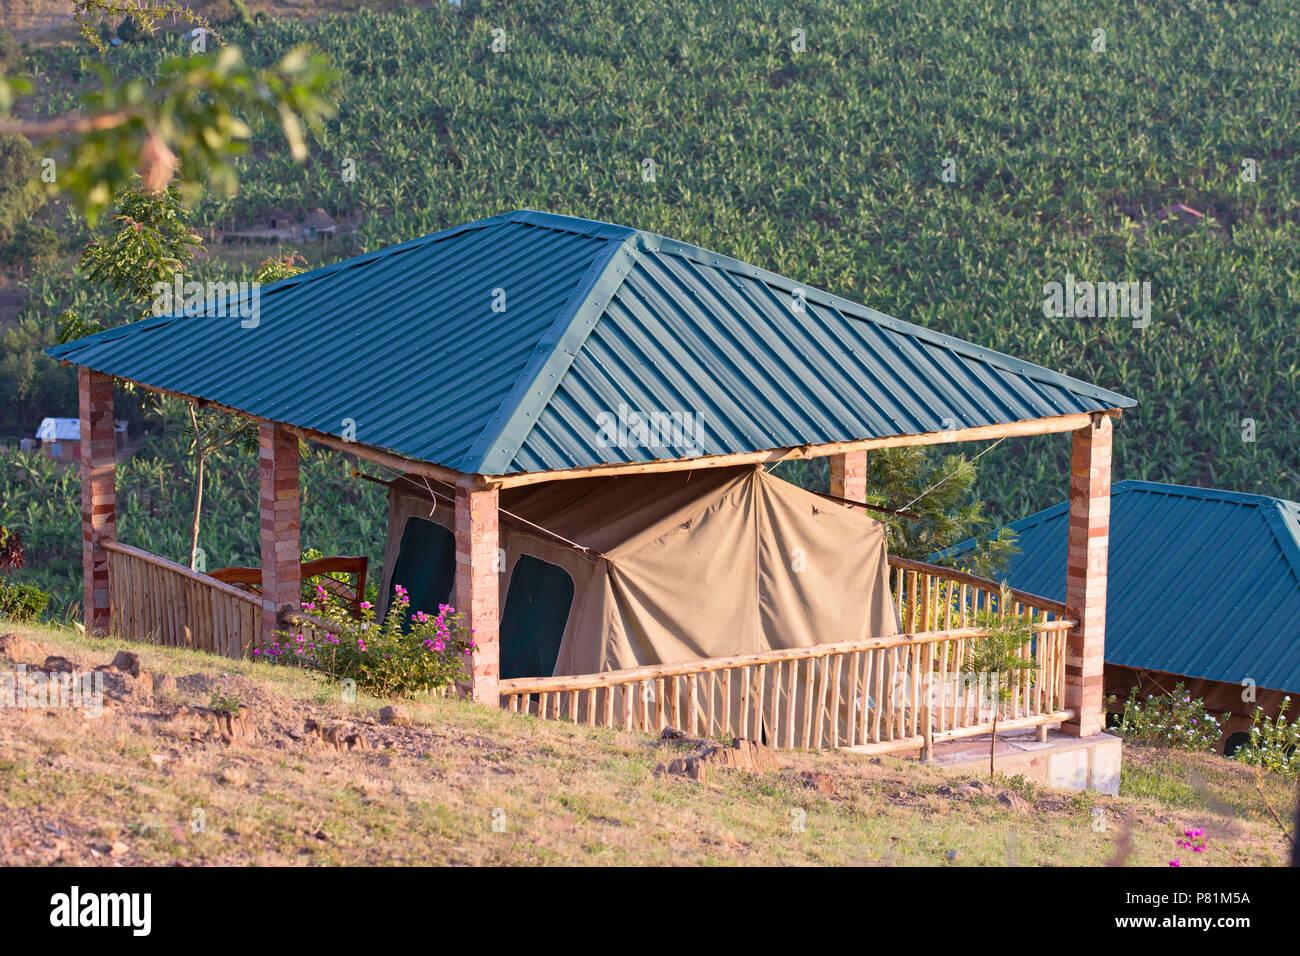 Eagle's Nest, Tented Camp en el lago Mburo, Safari Lodge, Resort, Uganda, África Oriental Imagen De Stock